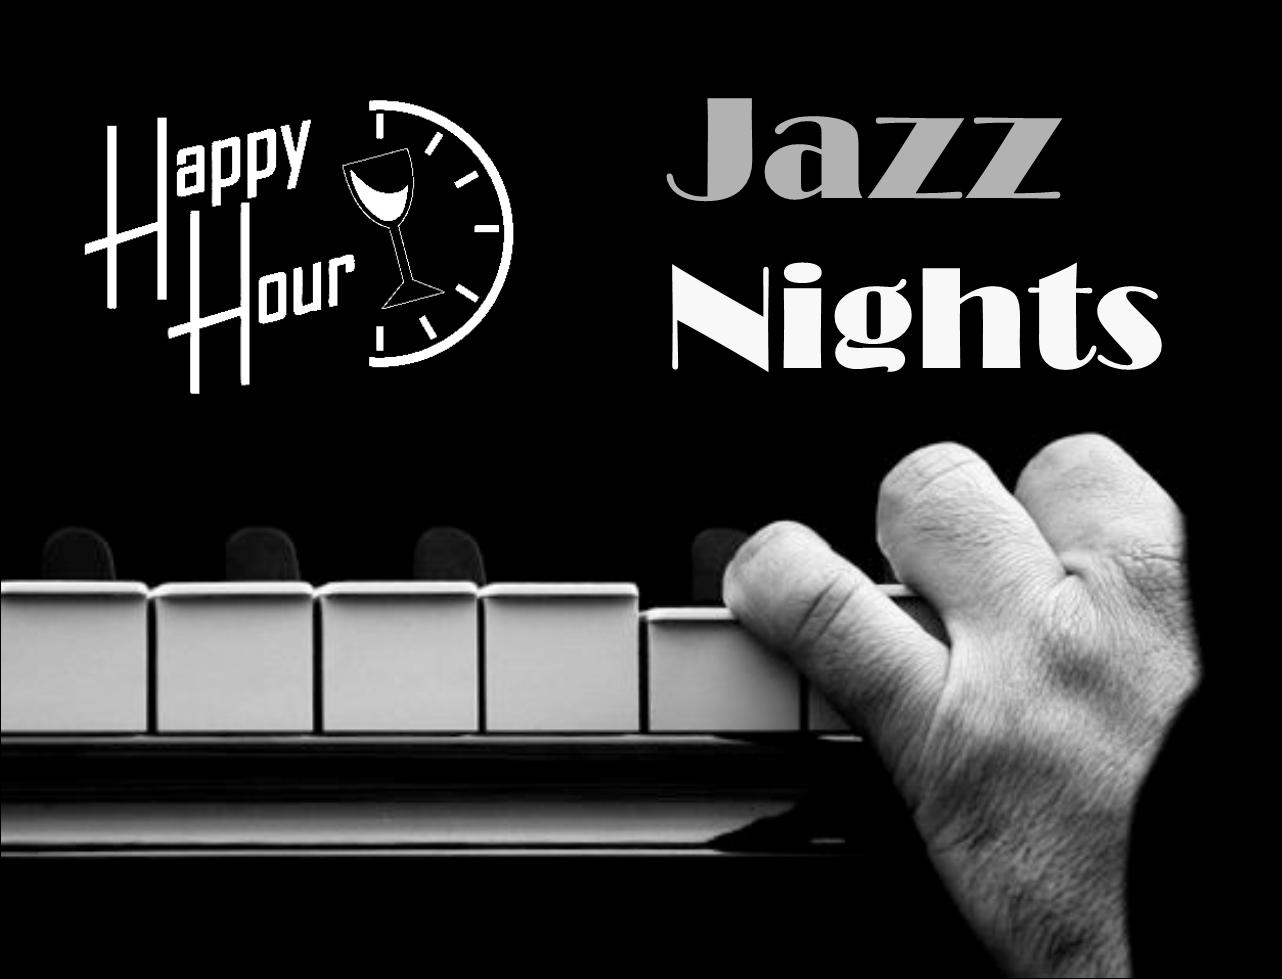 Jazz Cocktail & Last Happy Hour (Cocktail)